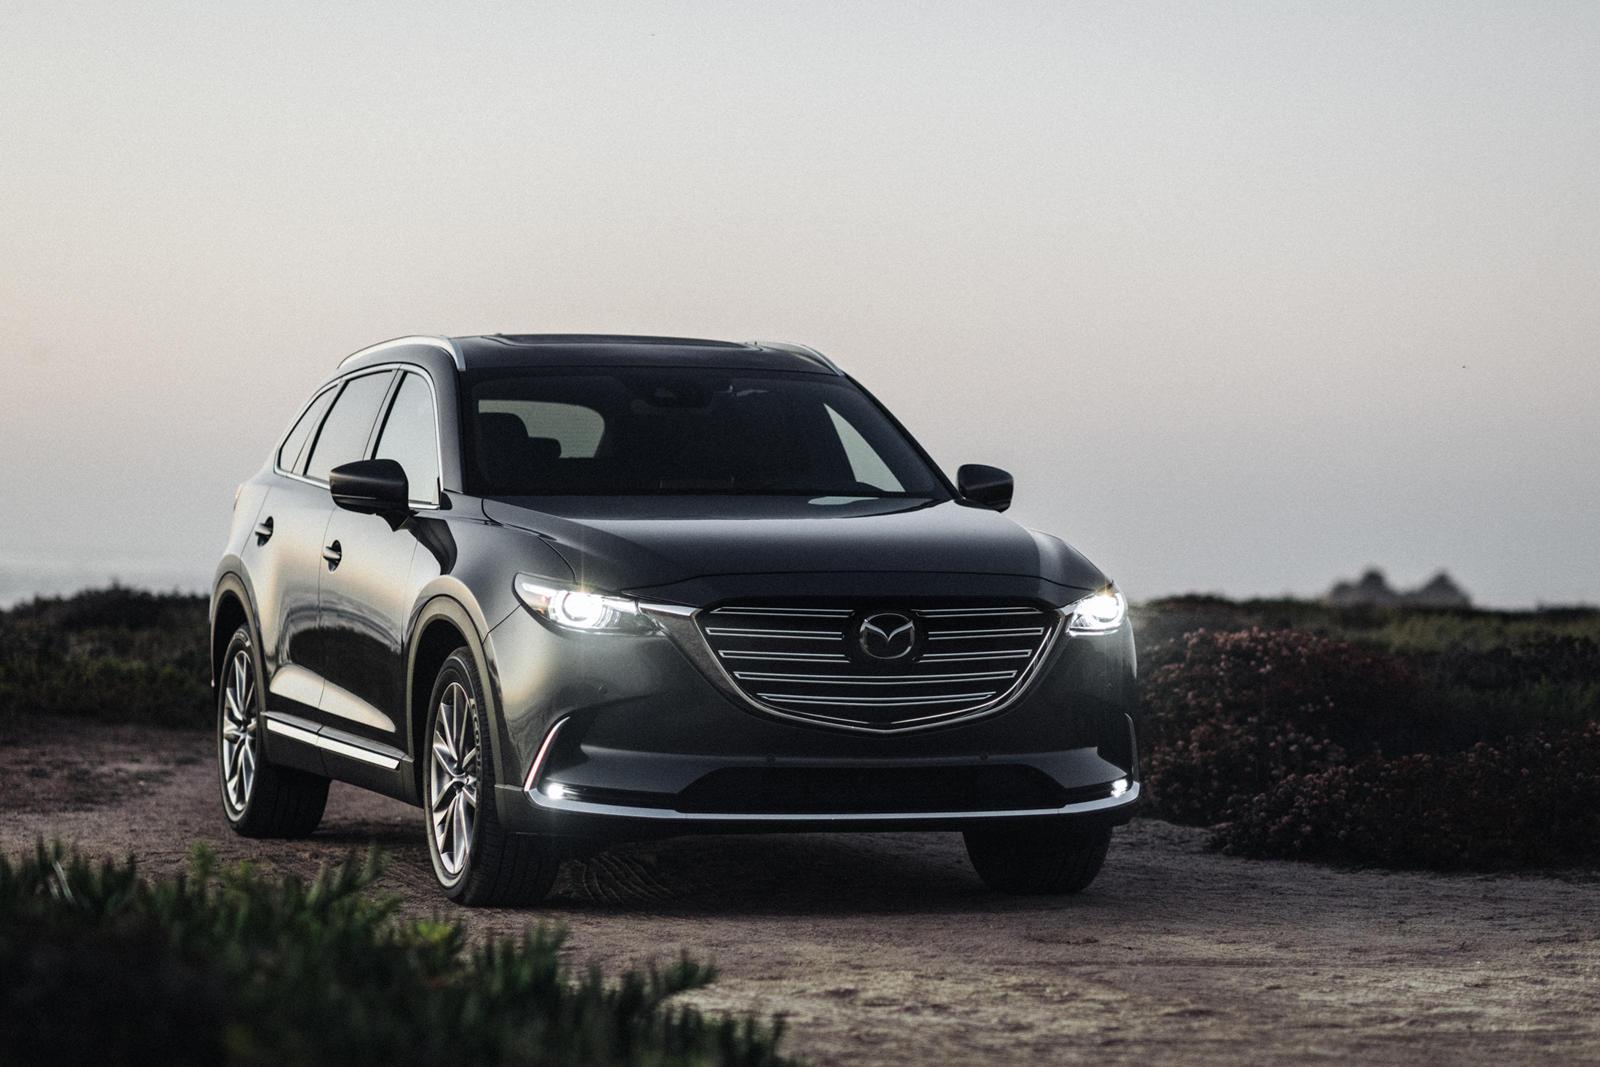 2020 Mazda Cx 9 Rumors Speed Test